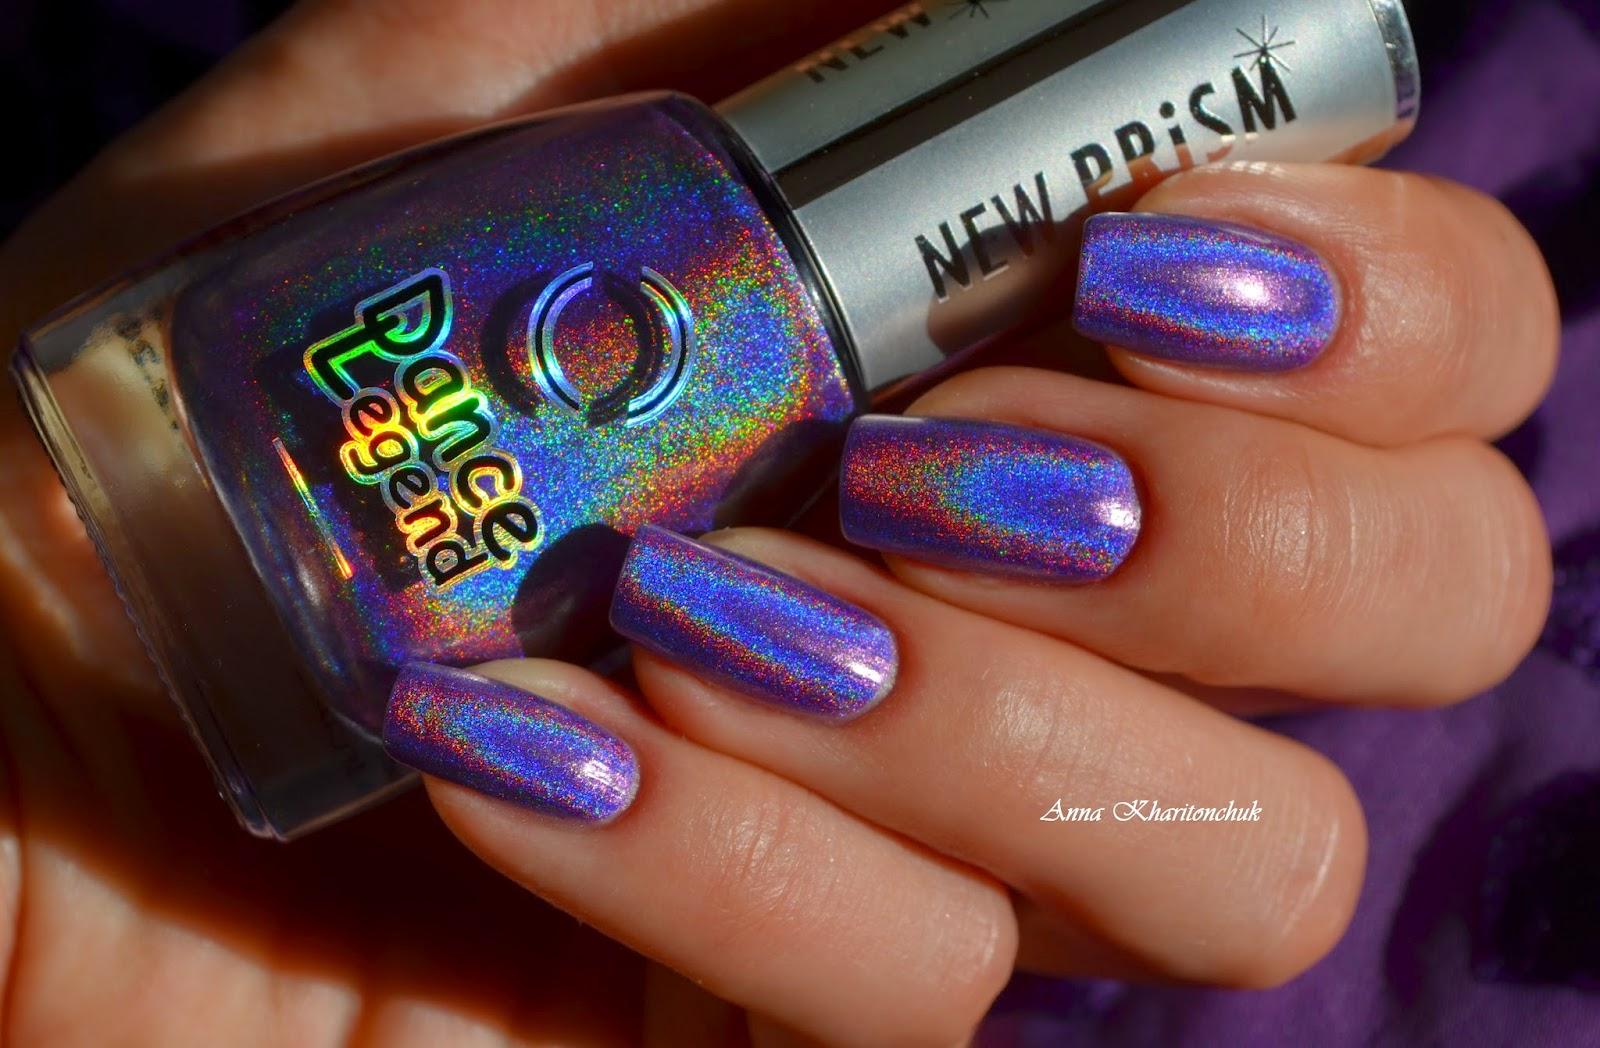 Dance Legend New Prism # 10 Cosmic Rainbow